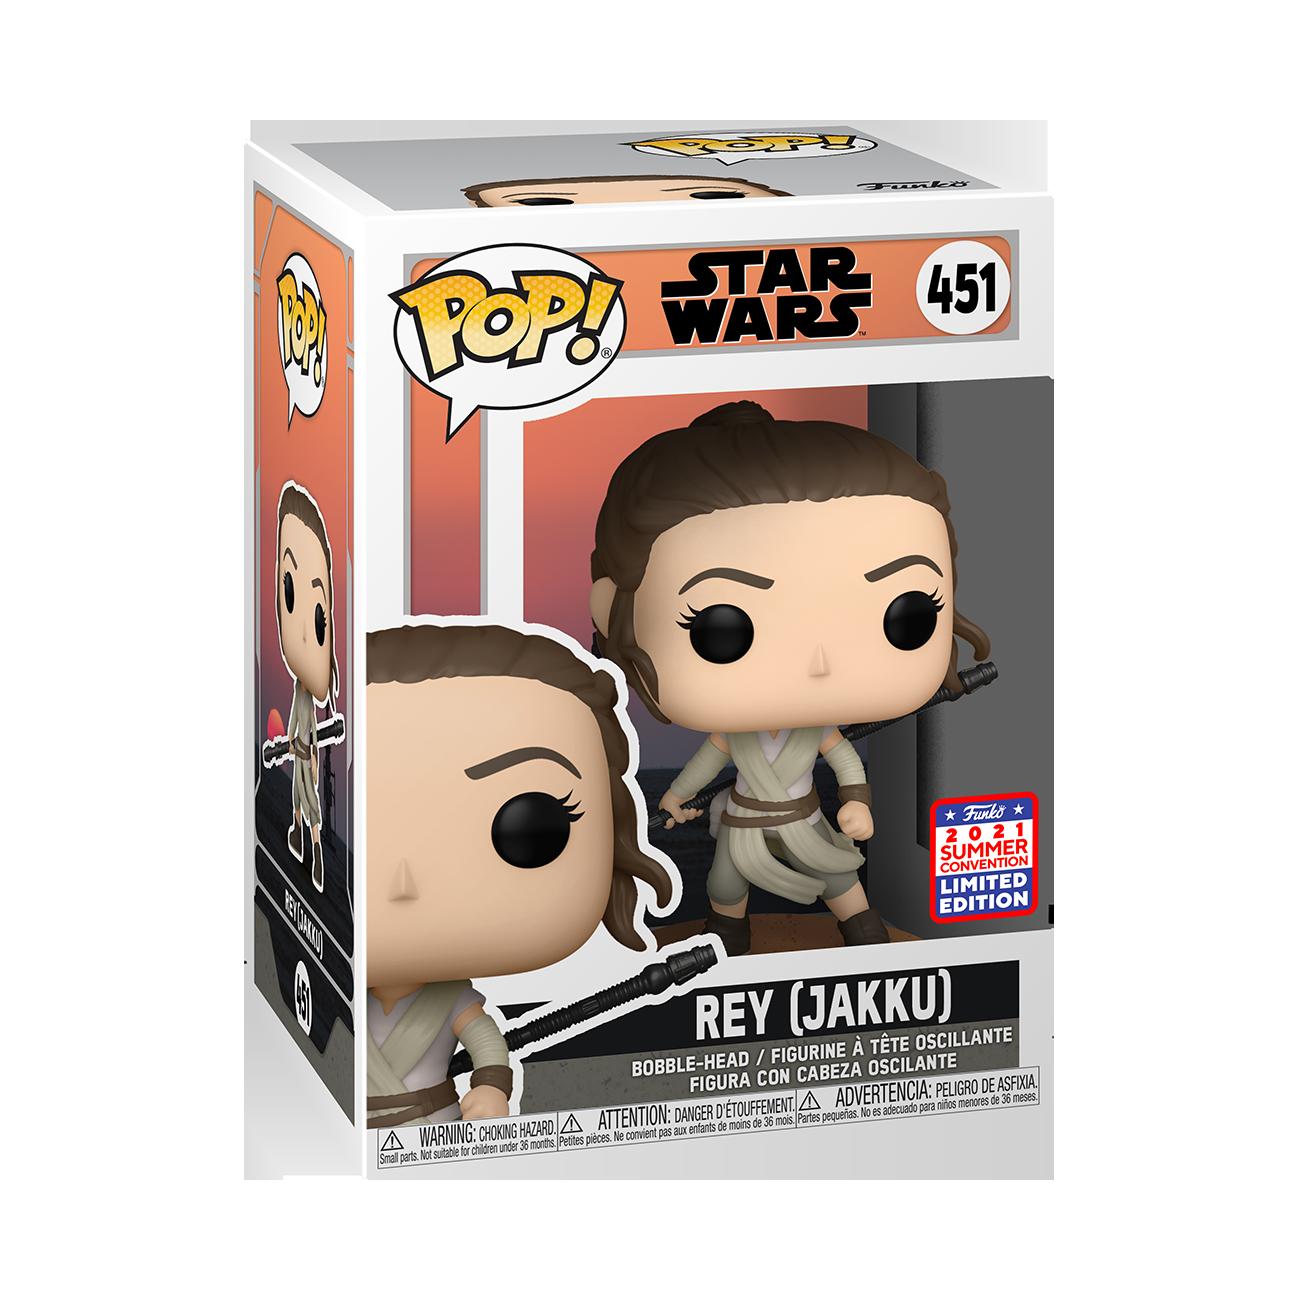 Star Wars: AtG - Rey Jakku Pop! Vinyl Figure